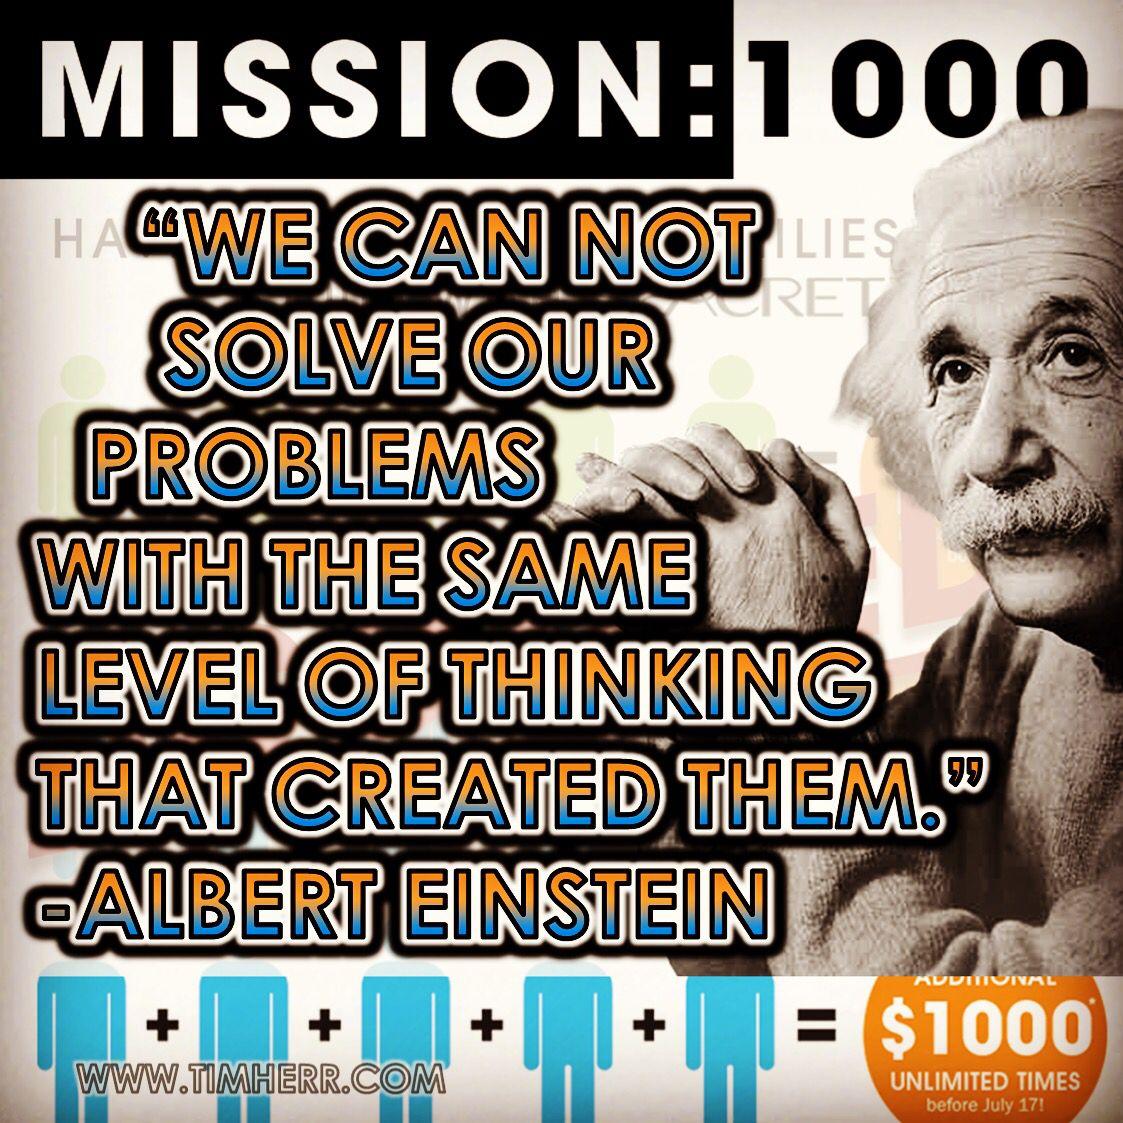 """We can not solve our problems with the same level of thinking that created them."" -Albert Einstein (Wurttemberg Physicist 1879-1955) #quoteoftheday #AlbertEinstein #Einstein"